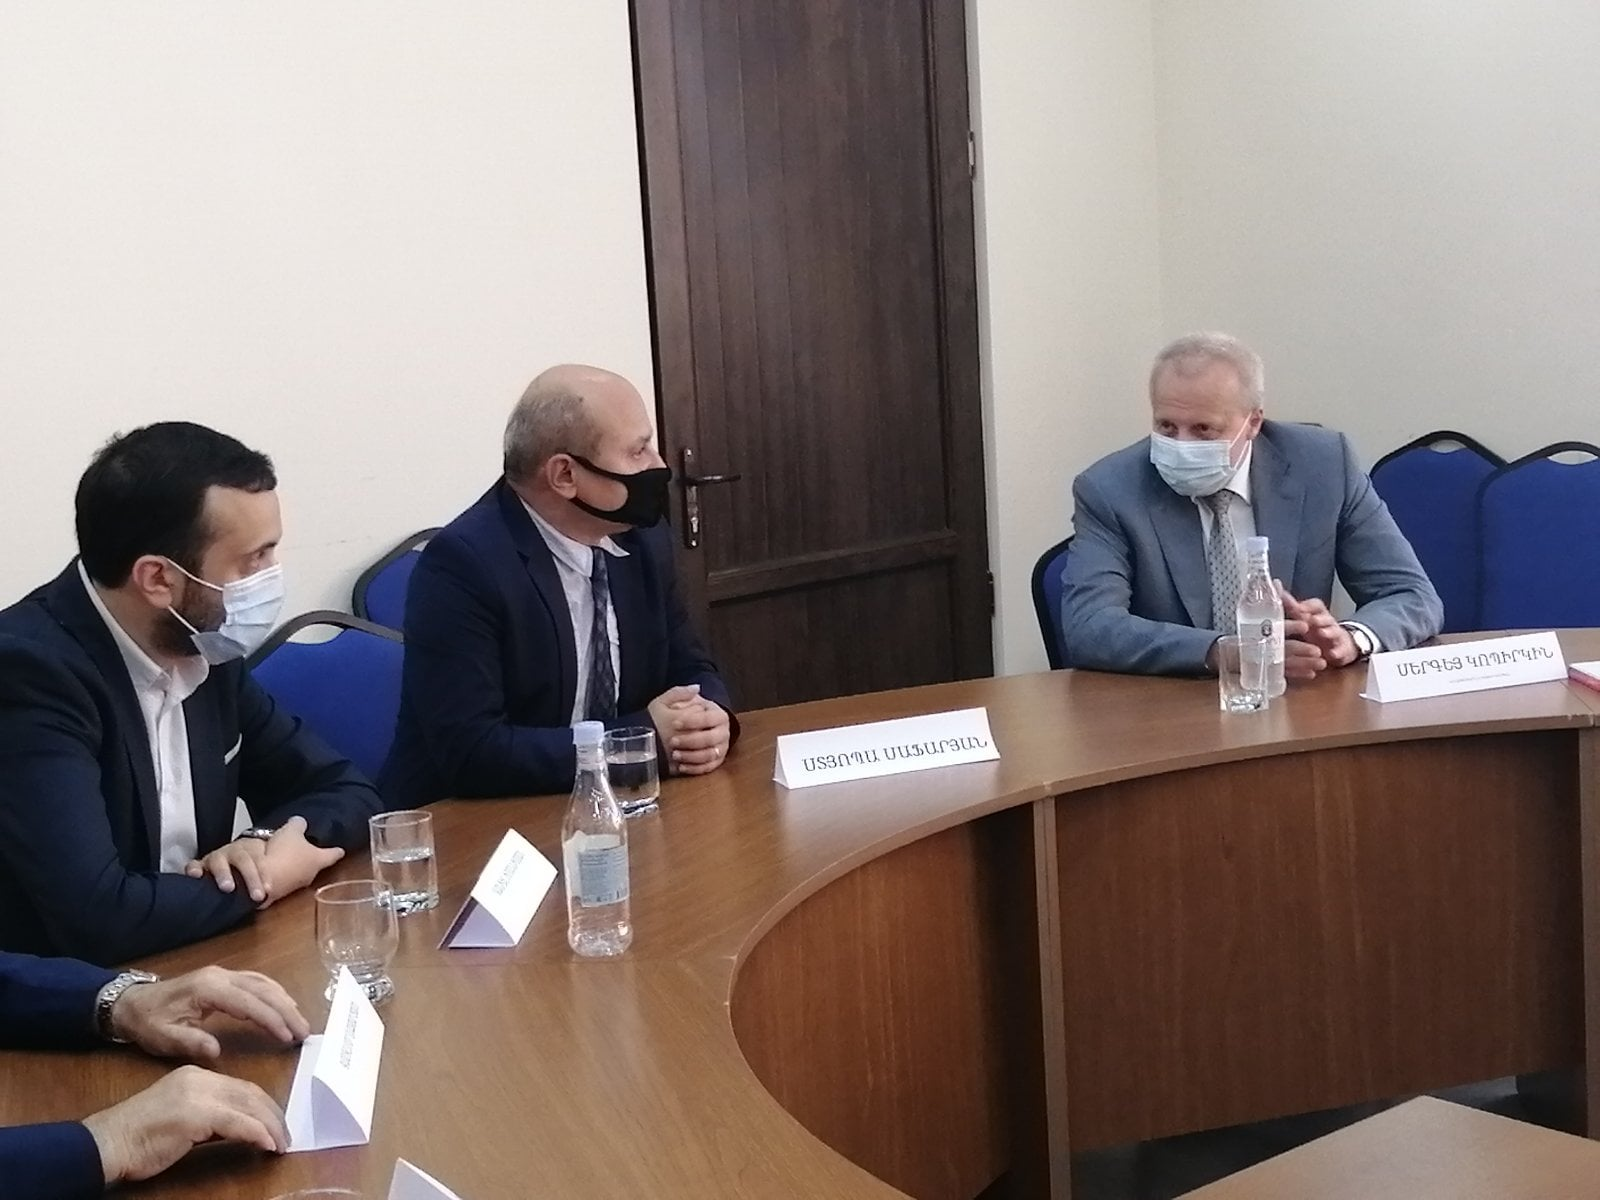 Photo of Հայաստանում ՌԴ դեսպան Սերգեյ Կոպիրկինը հանդիպել է ՀՀ Հանրային խորհրդի հետ